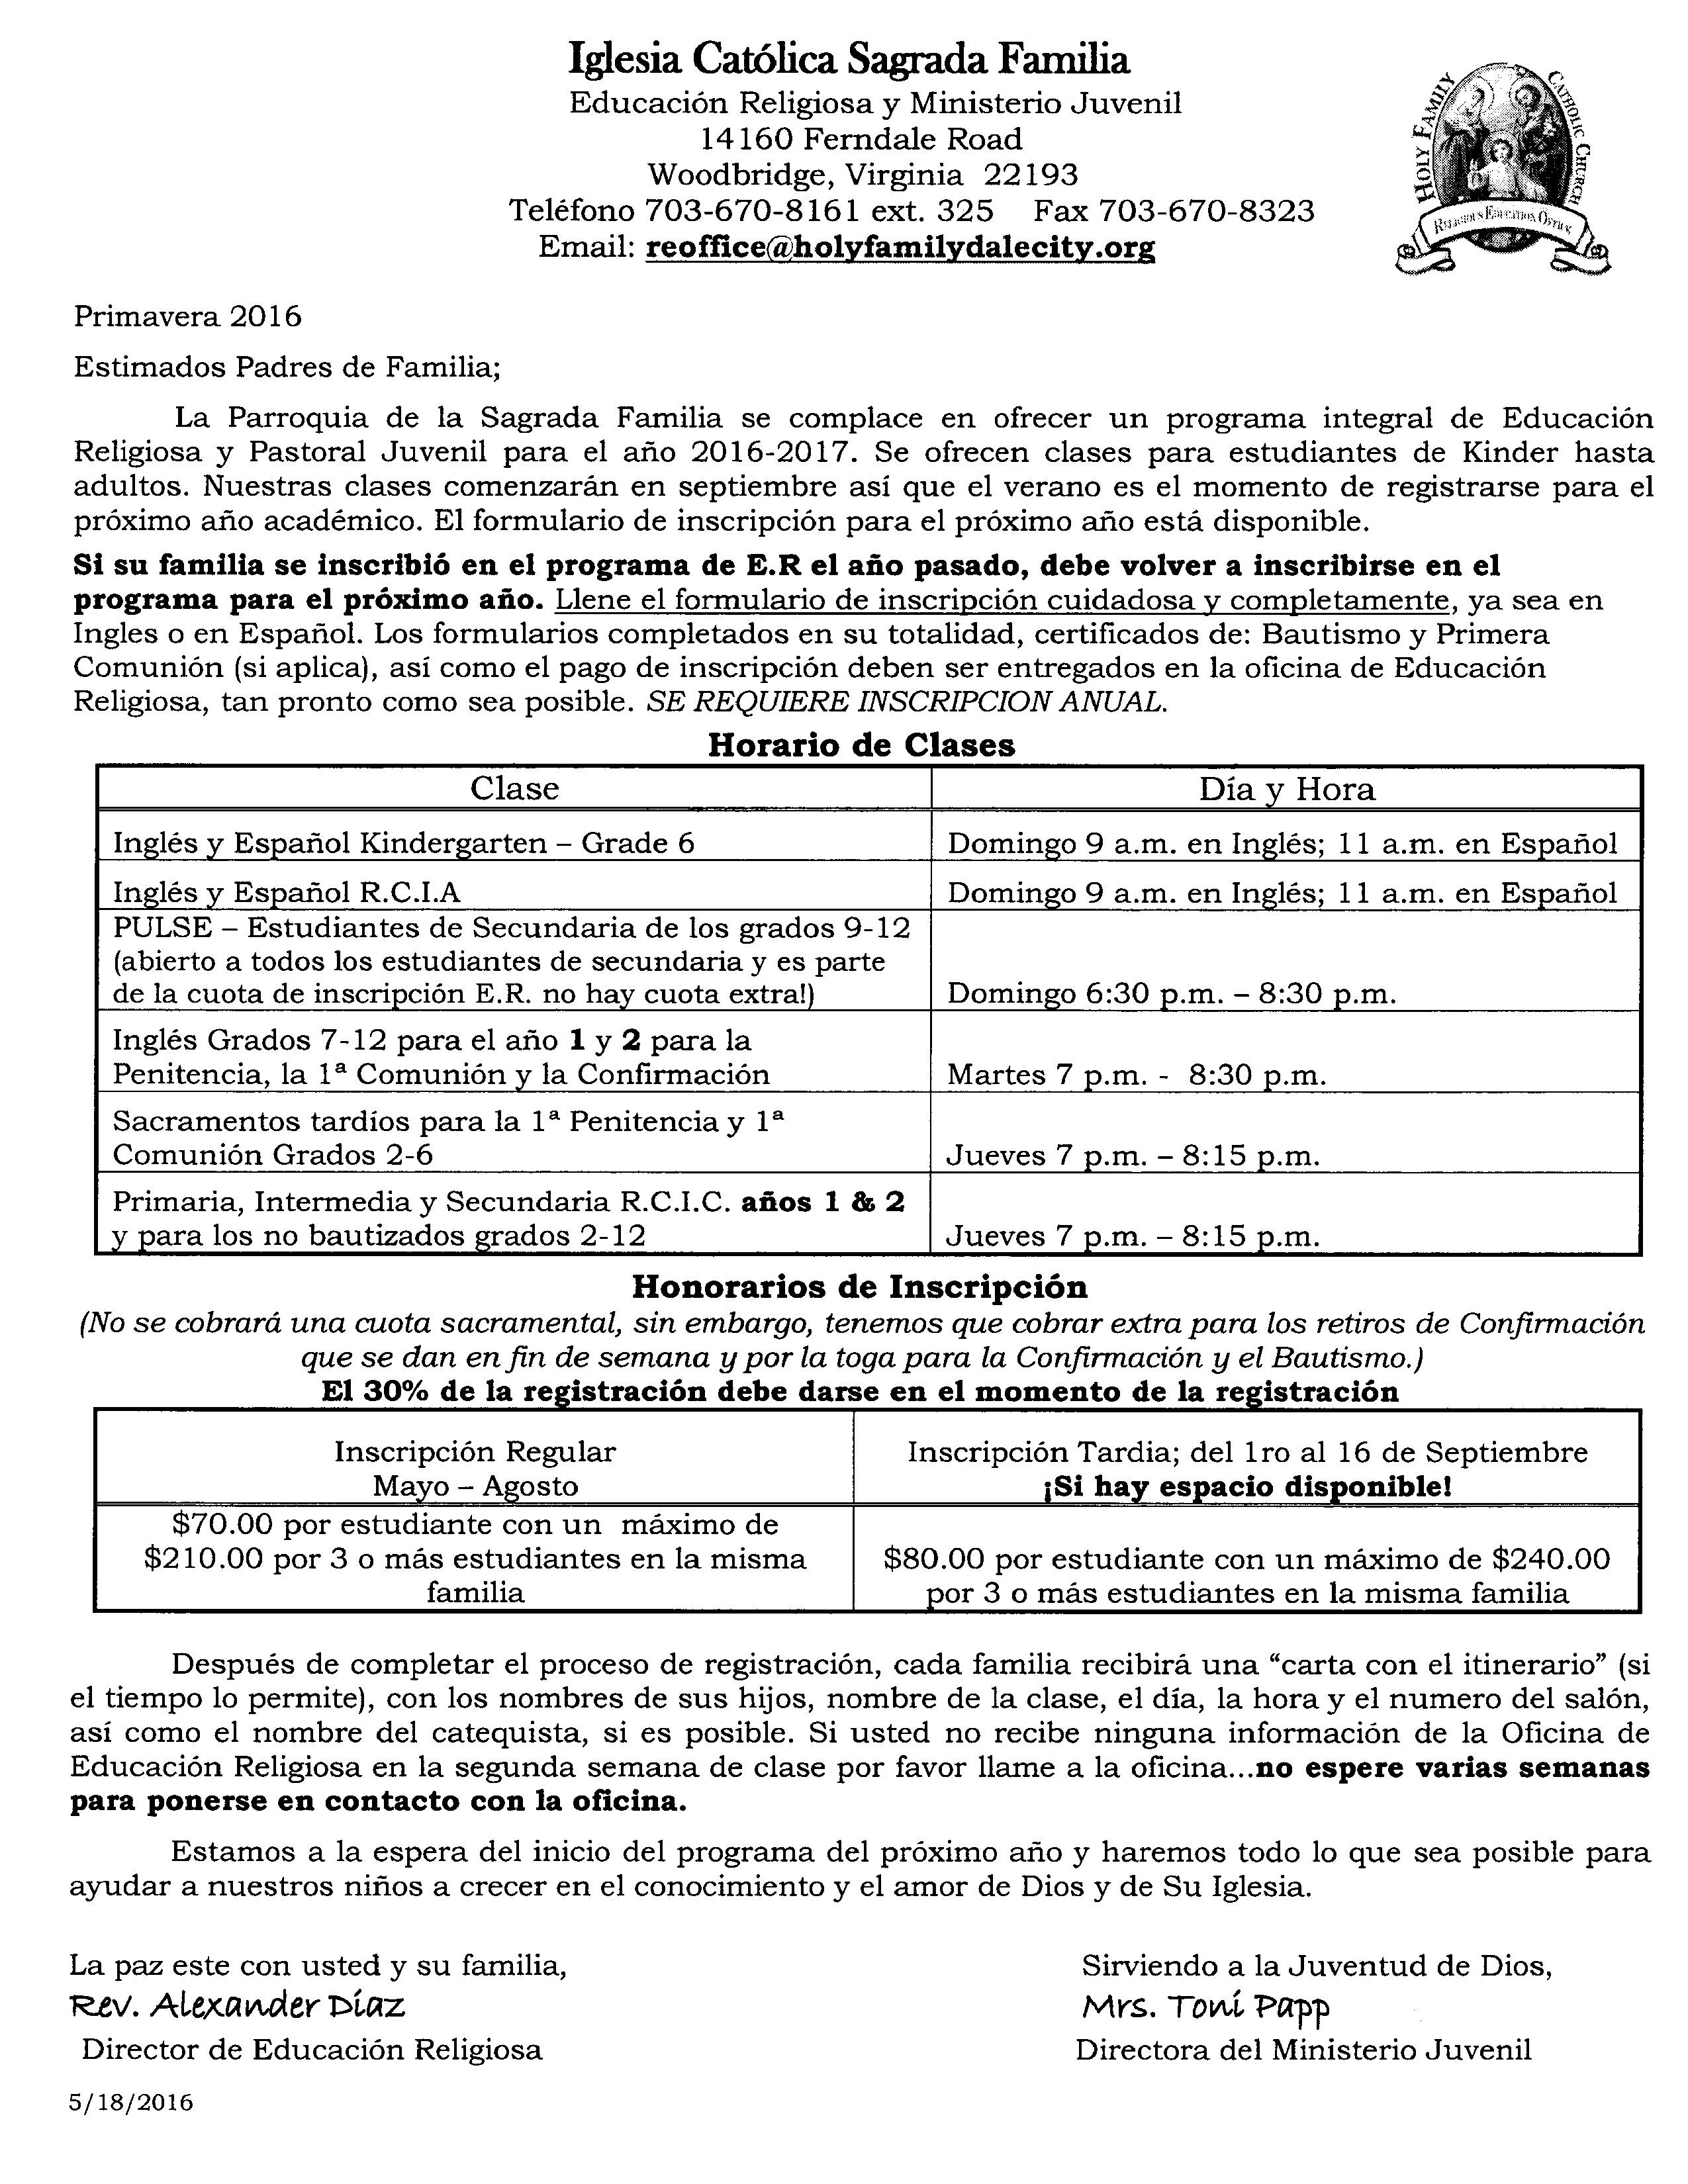 2016 - 2017 CCD Program Information (S)